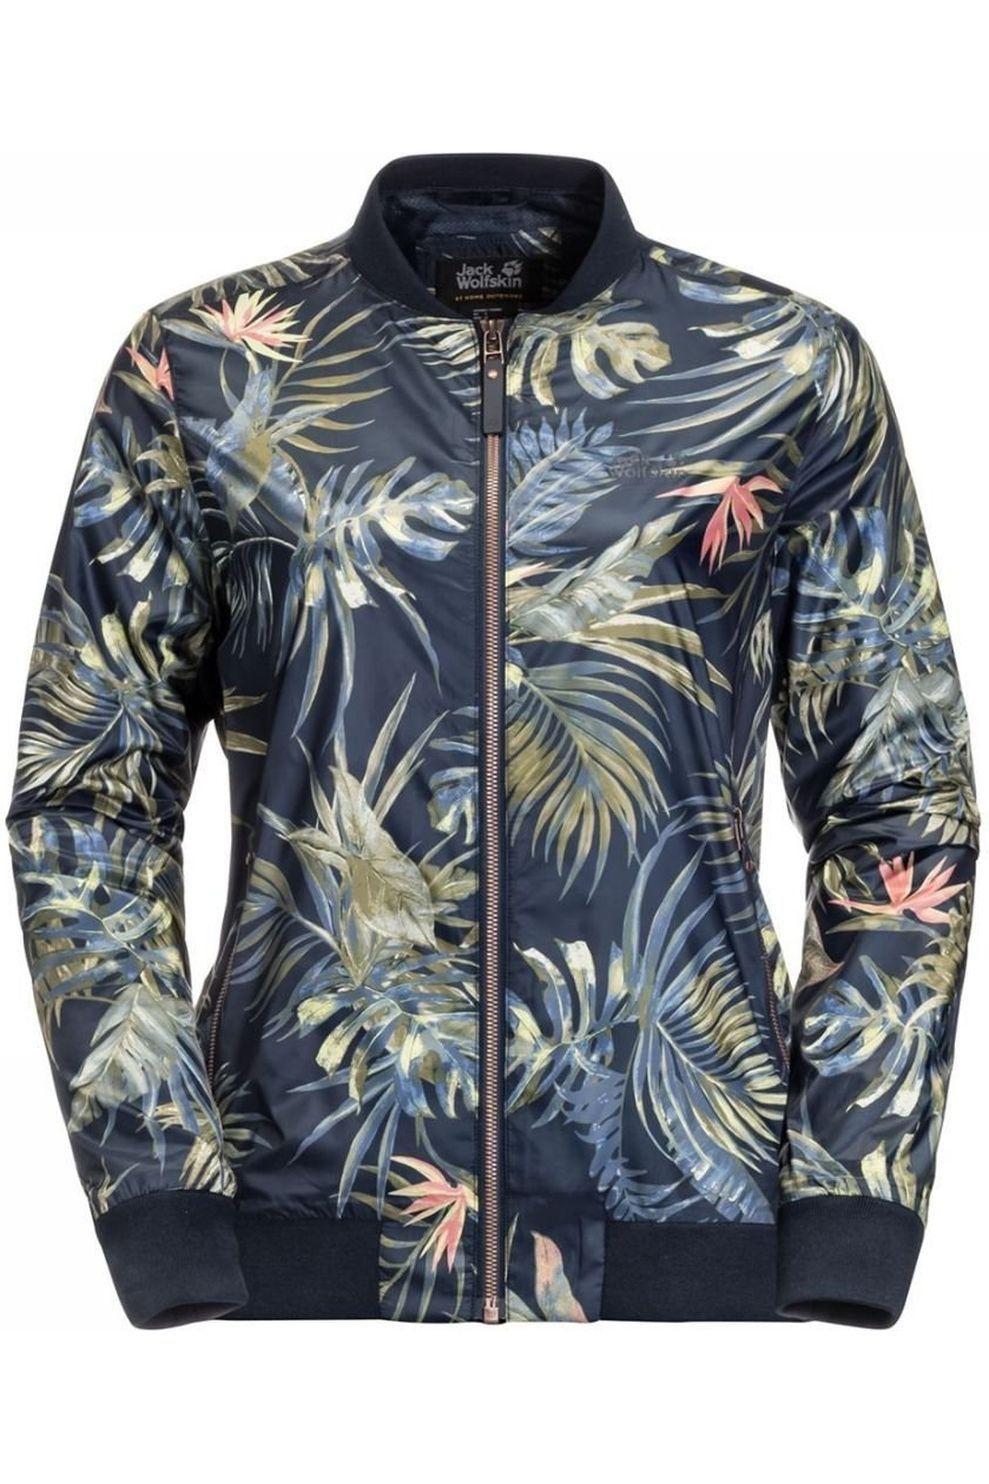 Jack Wolfskin Windstopper Tropical Blouson voor dames Blauw Maten: S, M, L, XL, XXL